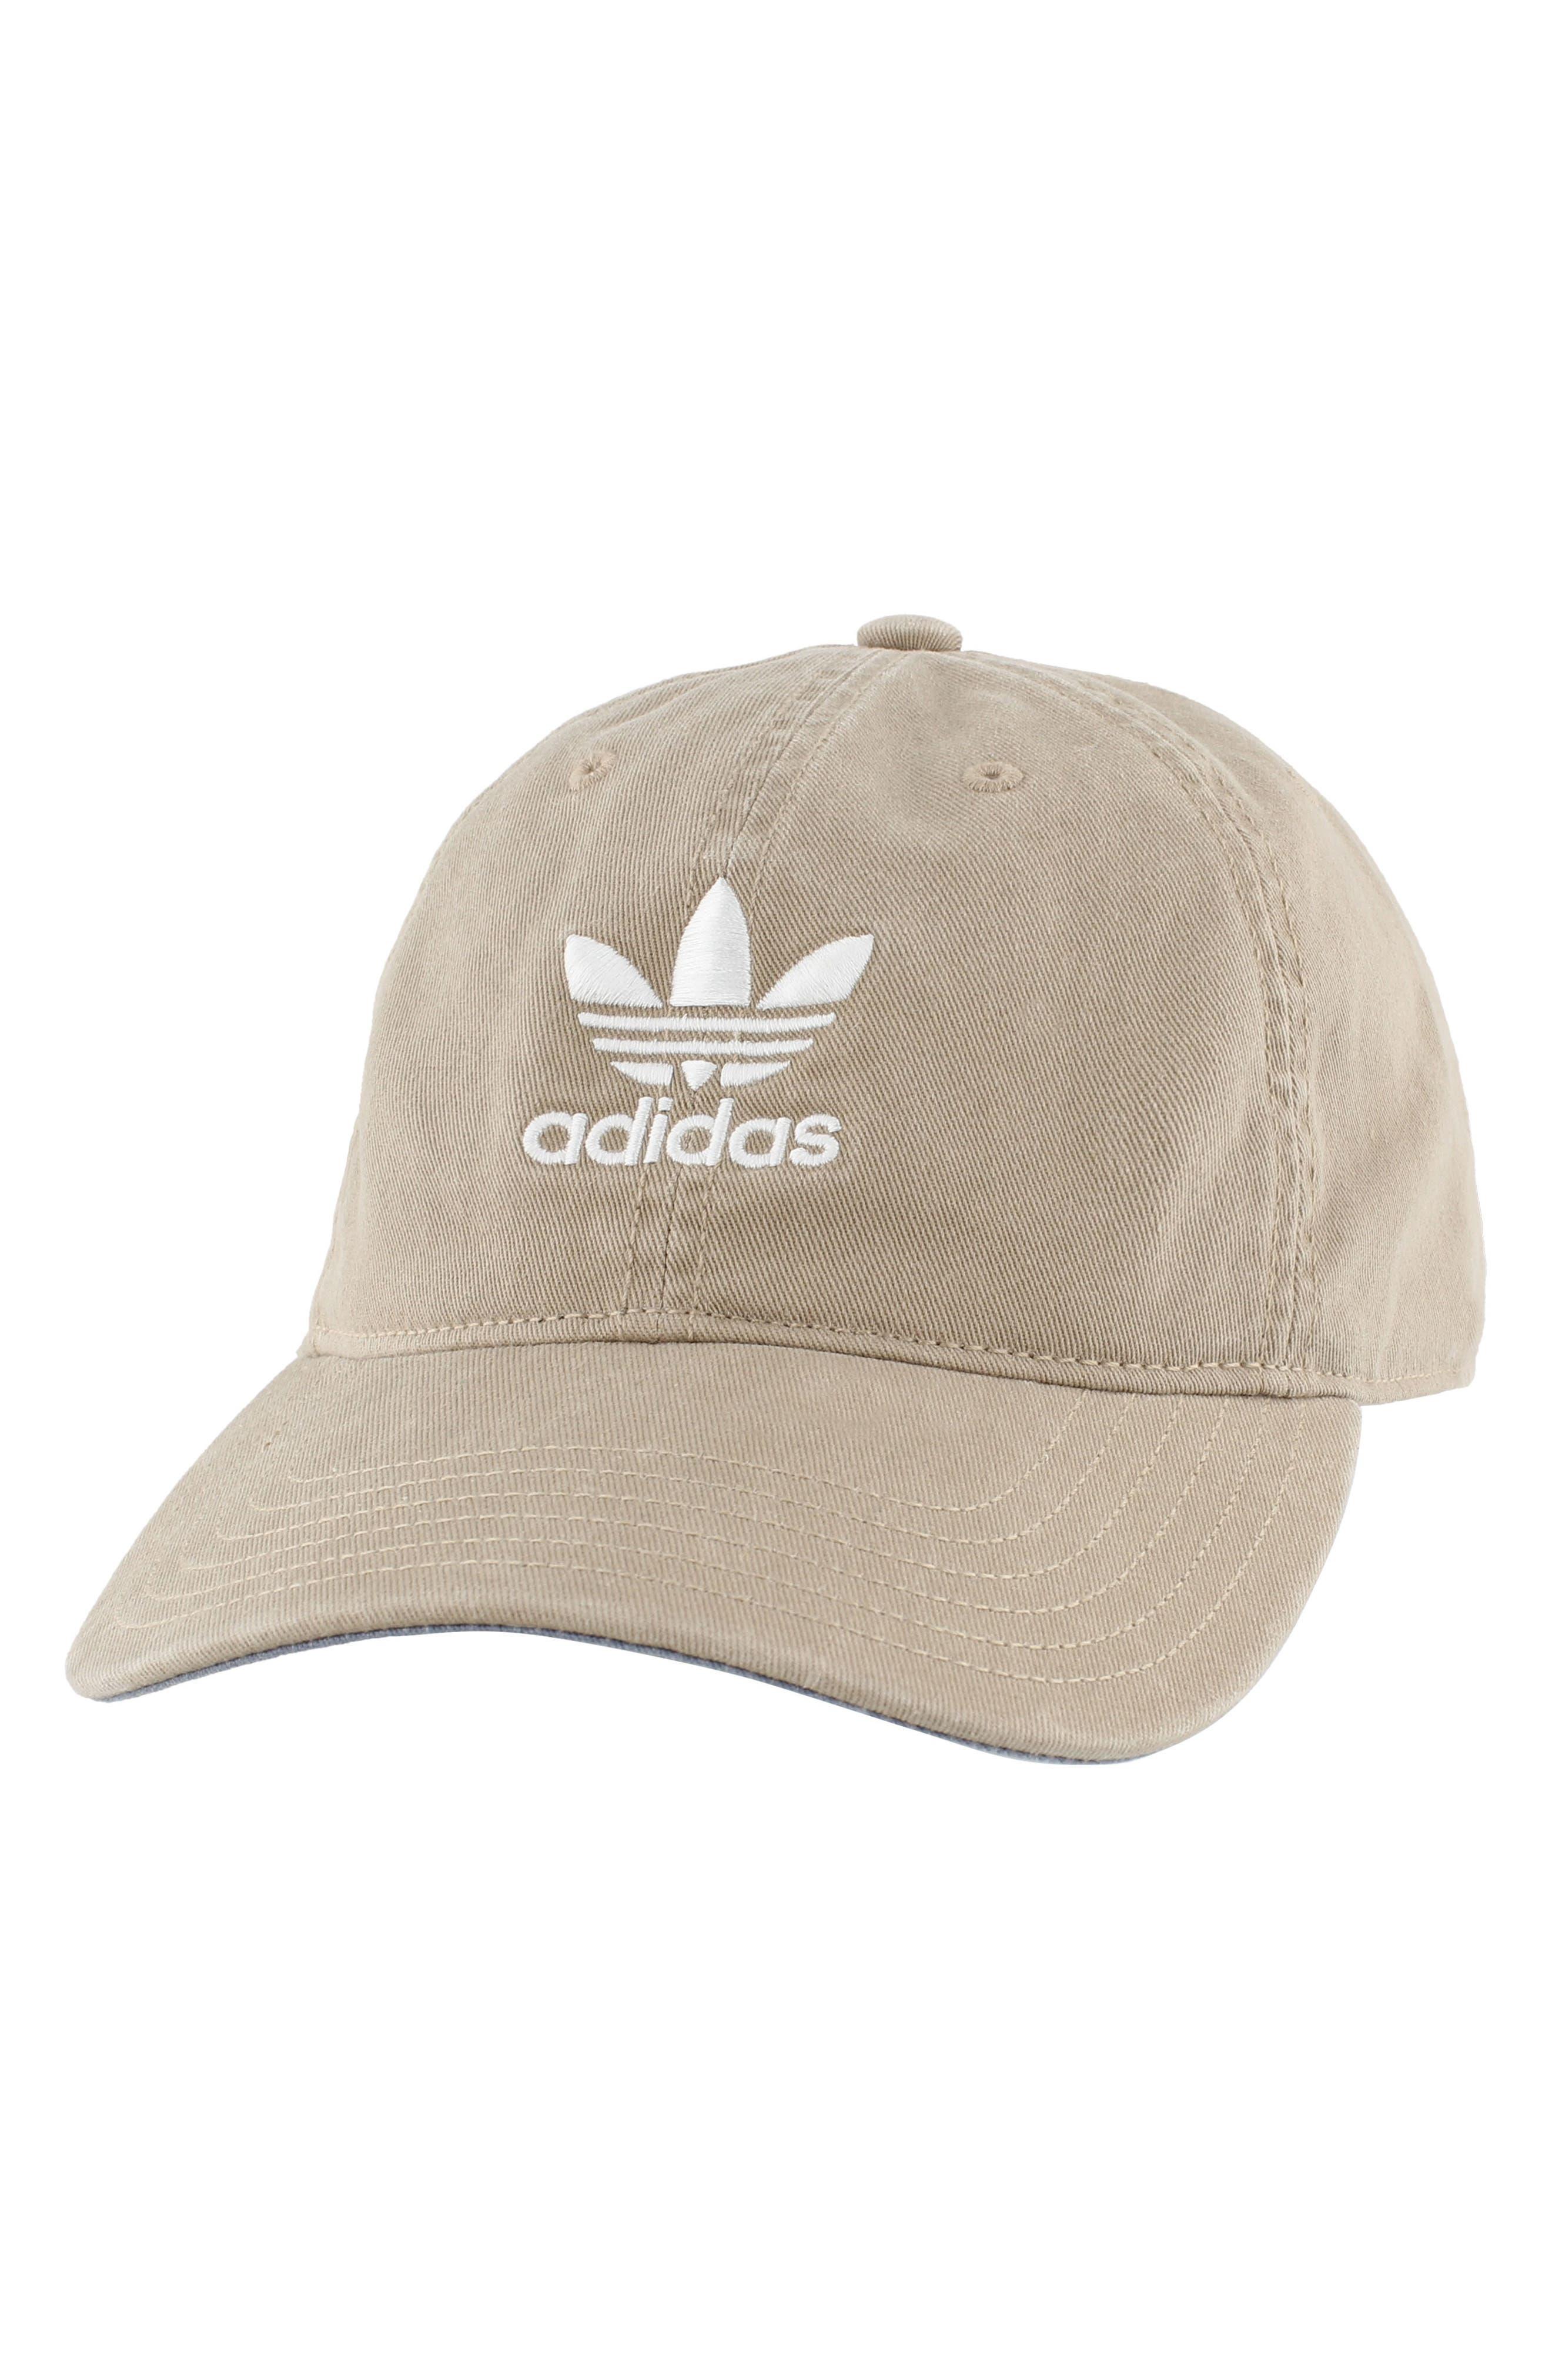 0c71184ac94 ... get eccellente black cotton cap snapdeal new york adidas originals  relaxed baseball cap d9243 4e092